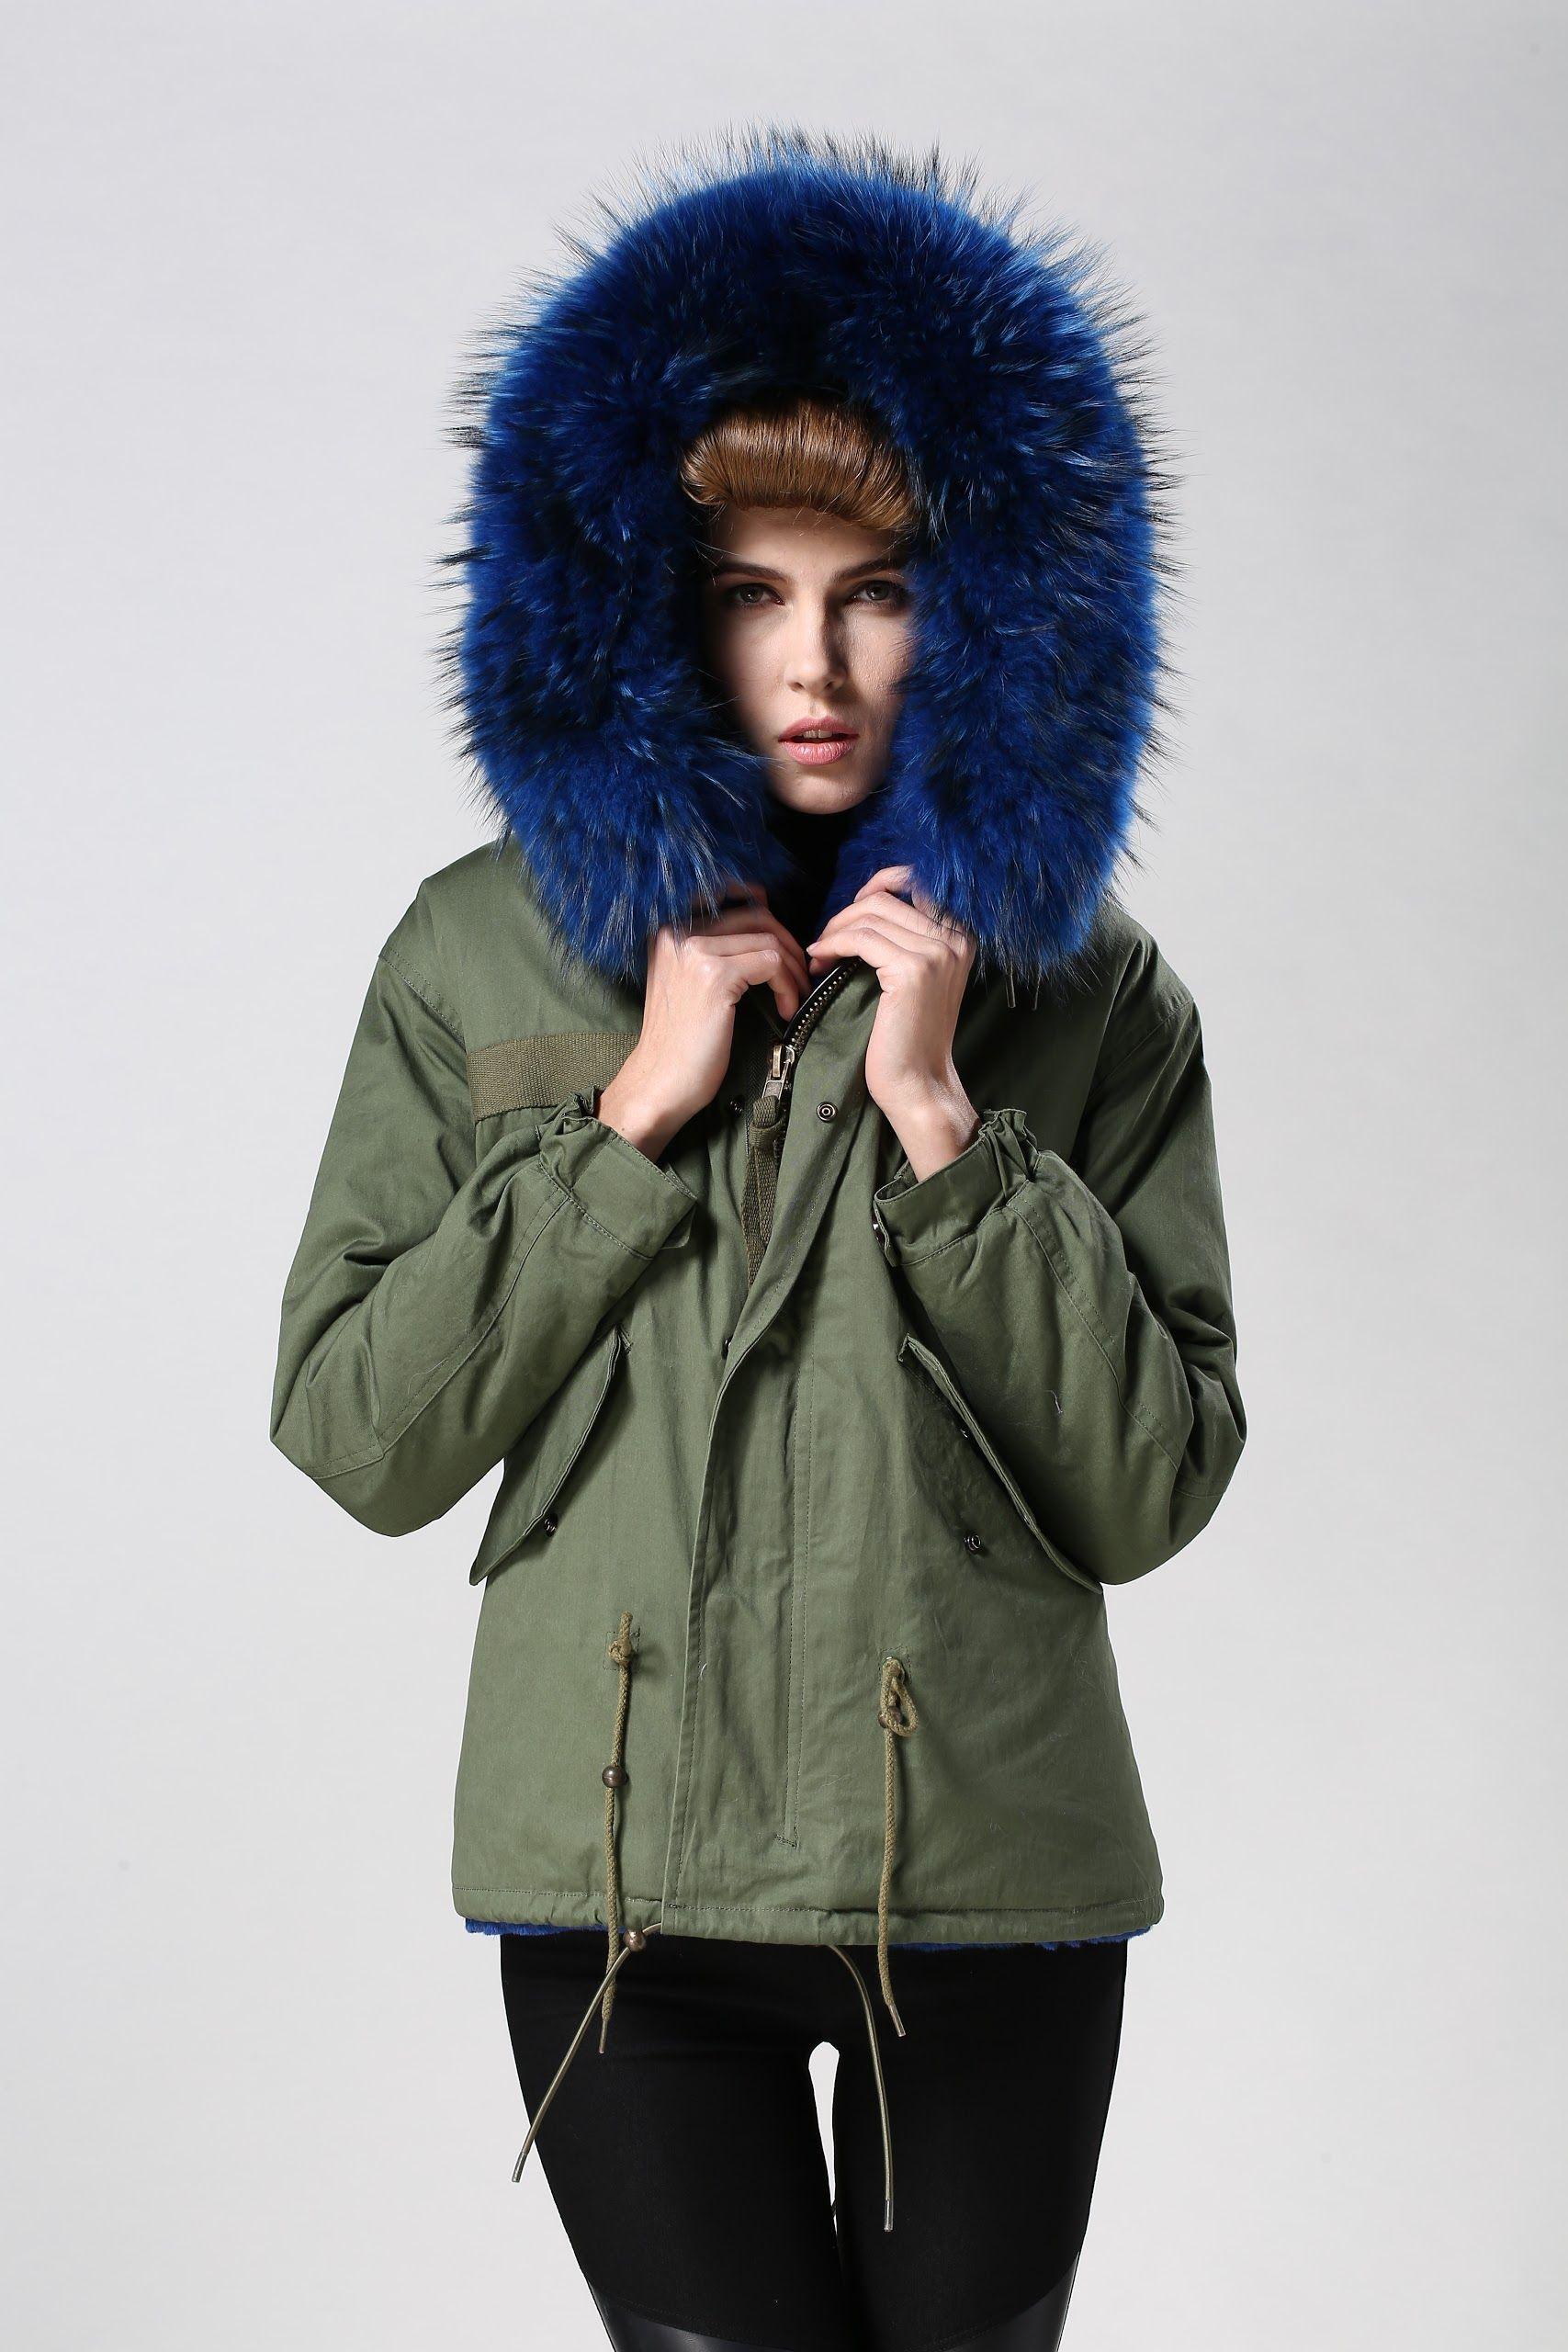 Redirecting Military Jacket Women Womens Fashion Jackets Army Fashion [ 2560 x 1707 Pixel ]